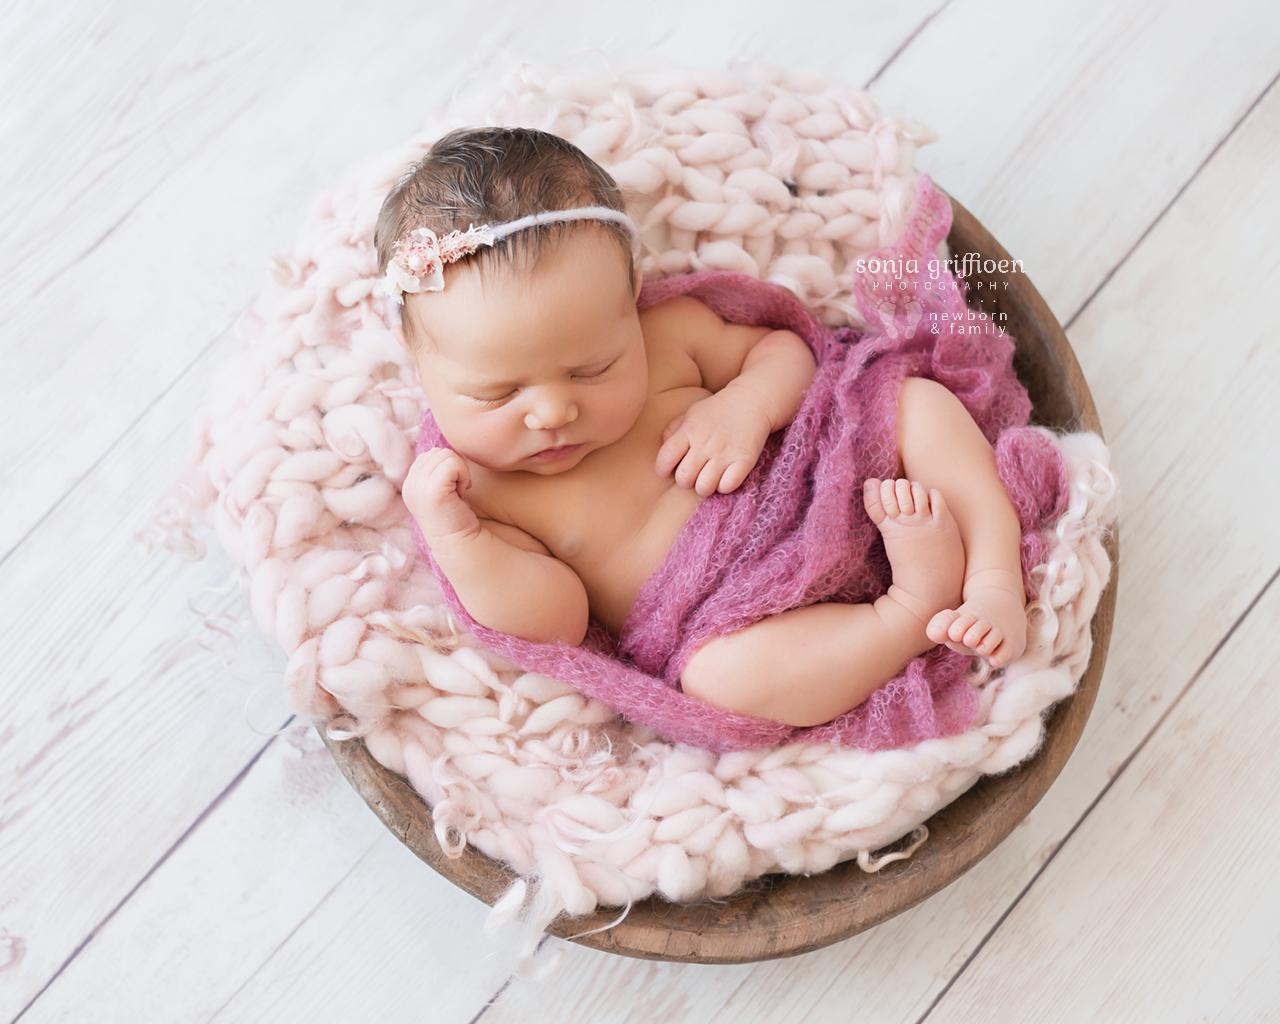 Maya-Newborn-Brisbane-Newborn-Photographer-Sonja-Griffioen-04.jpg